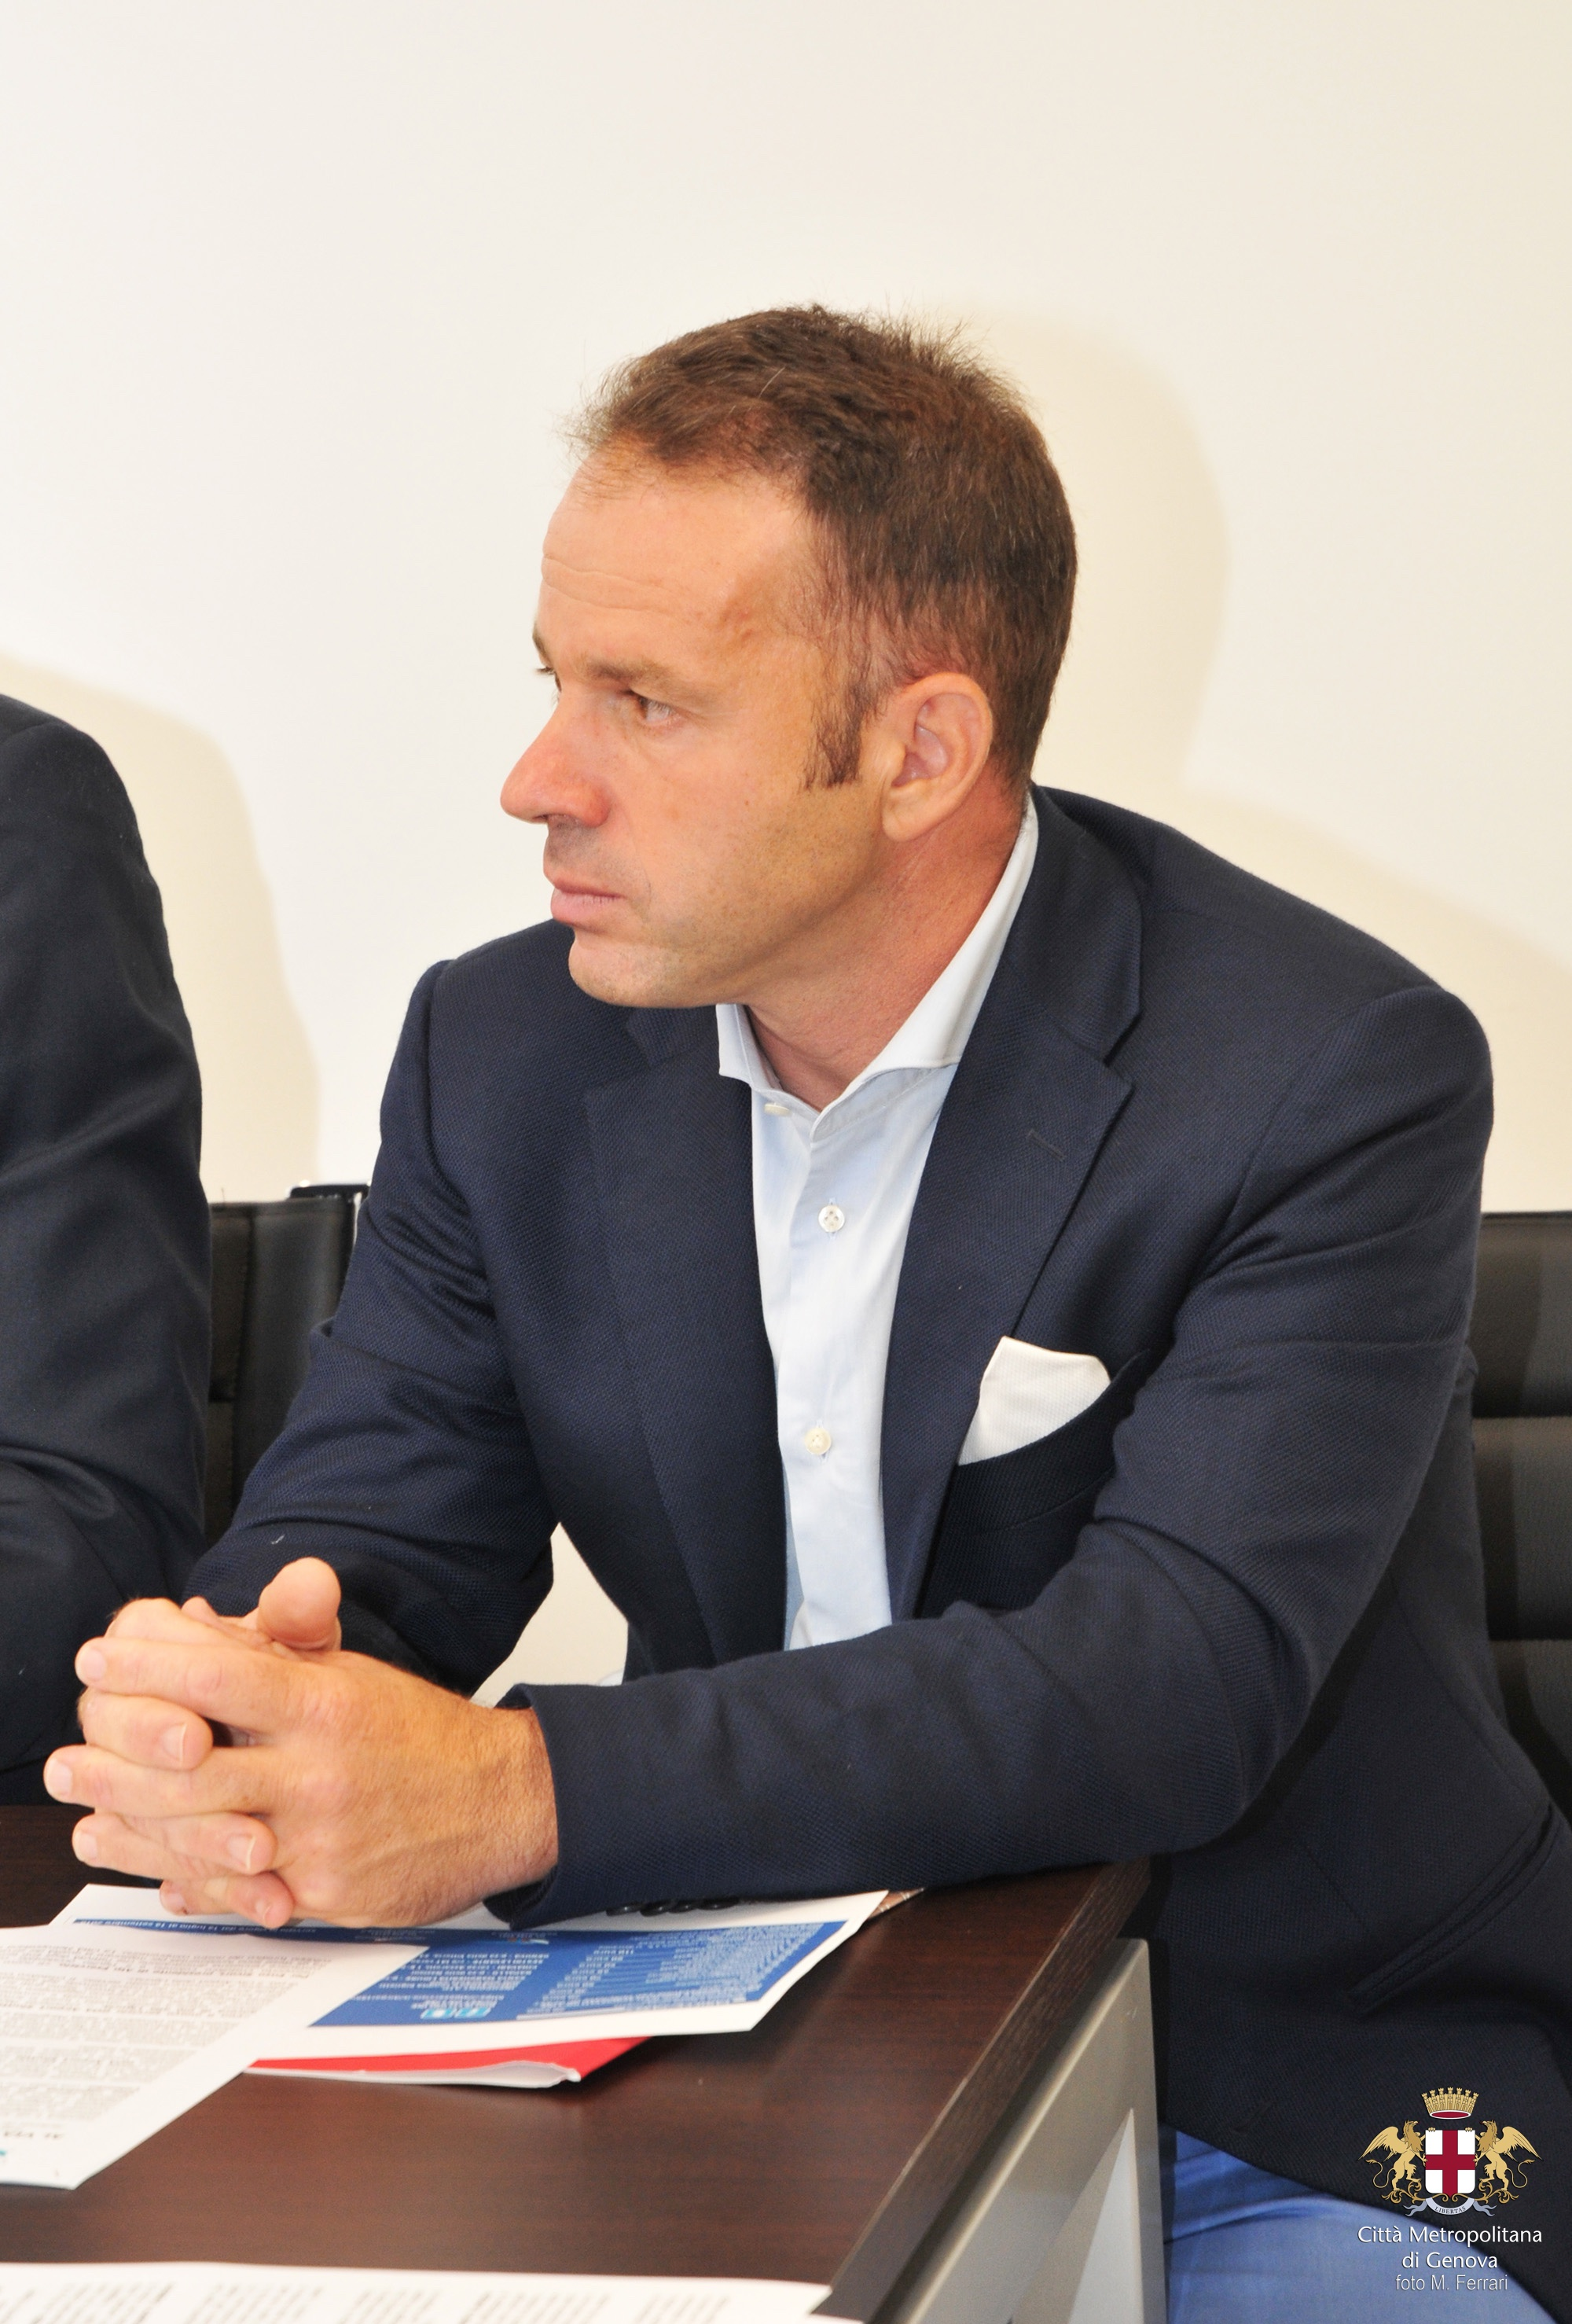 Matteo Viacava